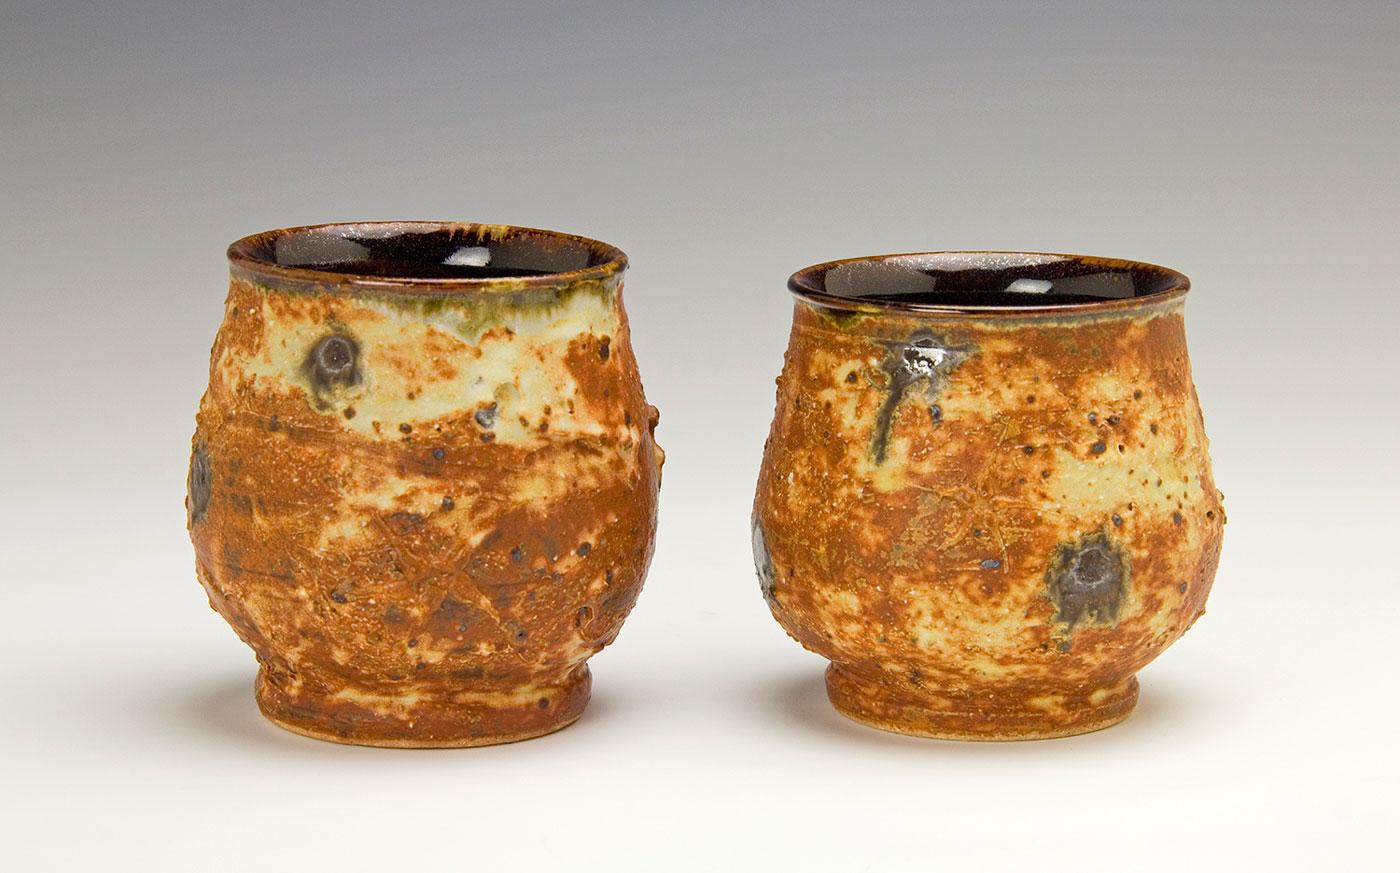 Art-Cup-Pair-Wild-Clay-Bruce-Gholson-Bulldog-Pottery.jpg